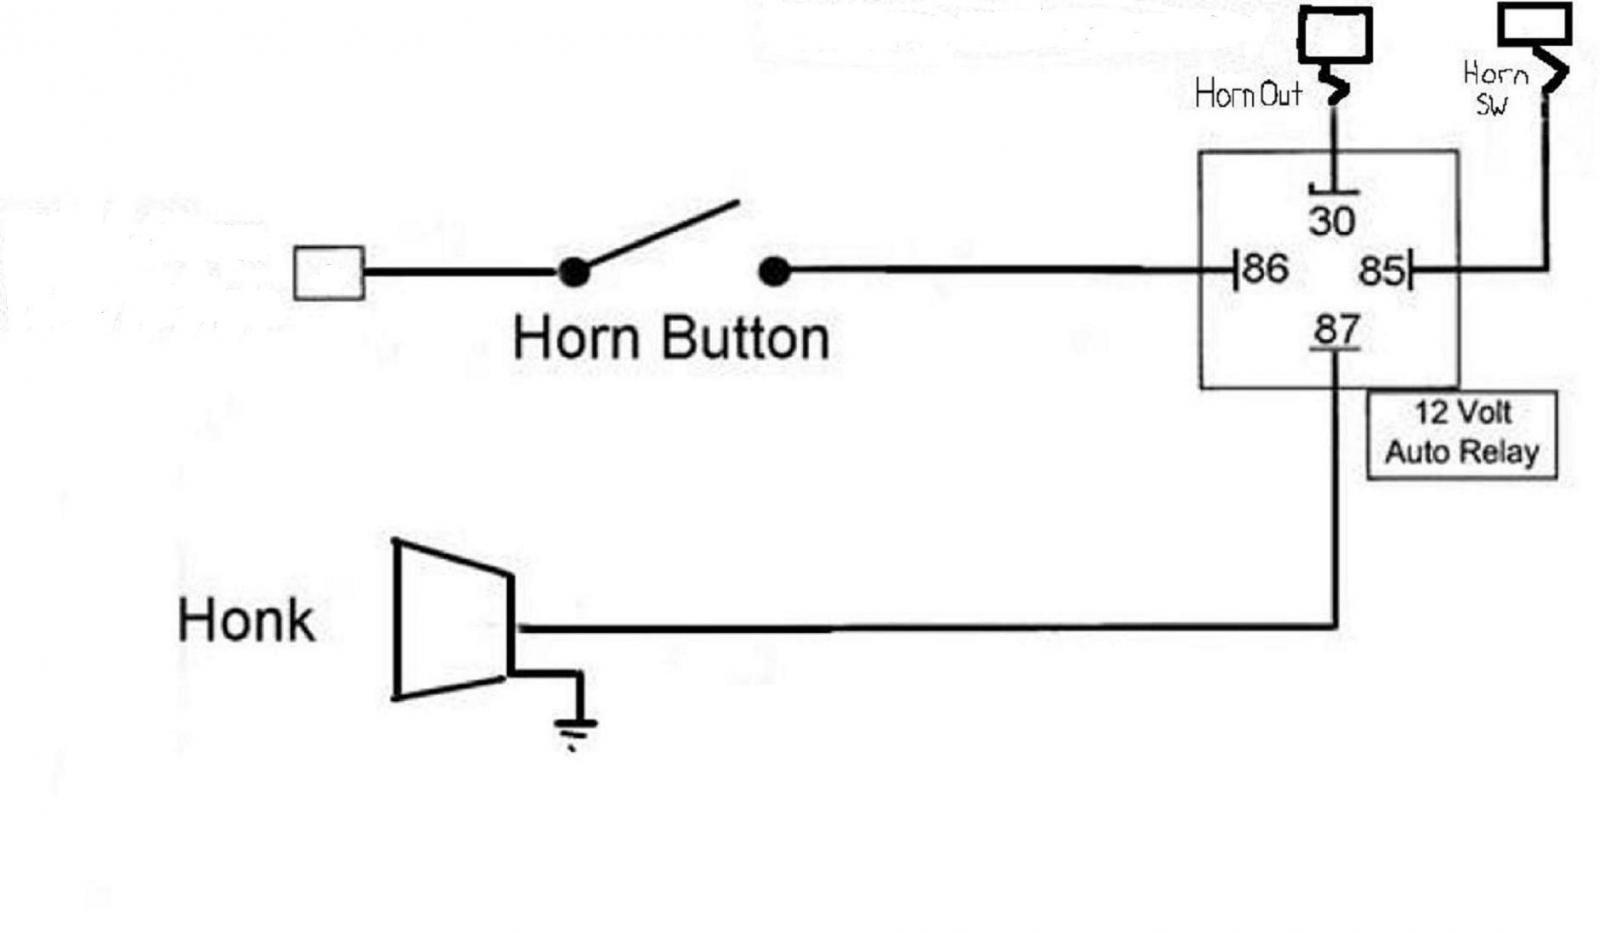 atv cdi wiring diagrams wiring diagram panelatv horn wiring wiring diagram detailedatv horn wiring suw ihero store \\\\u2022 atv cdi